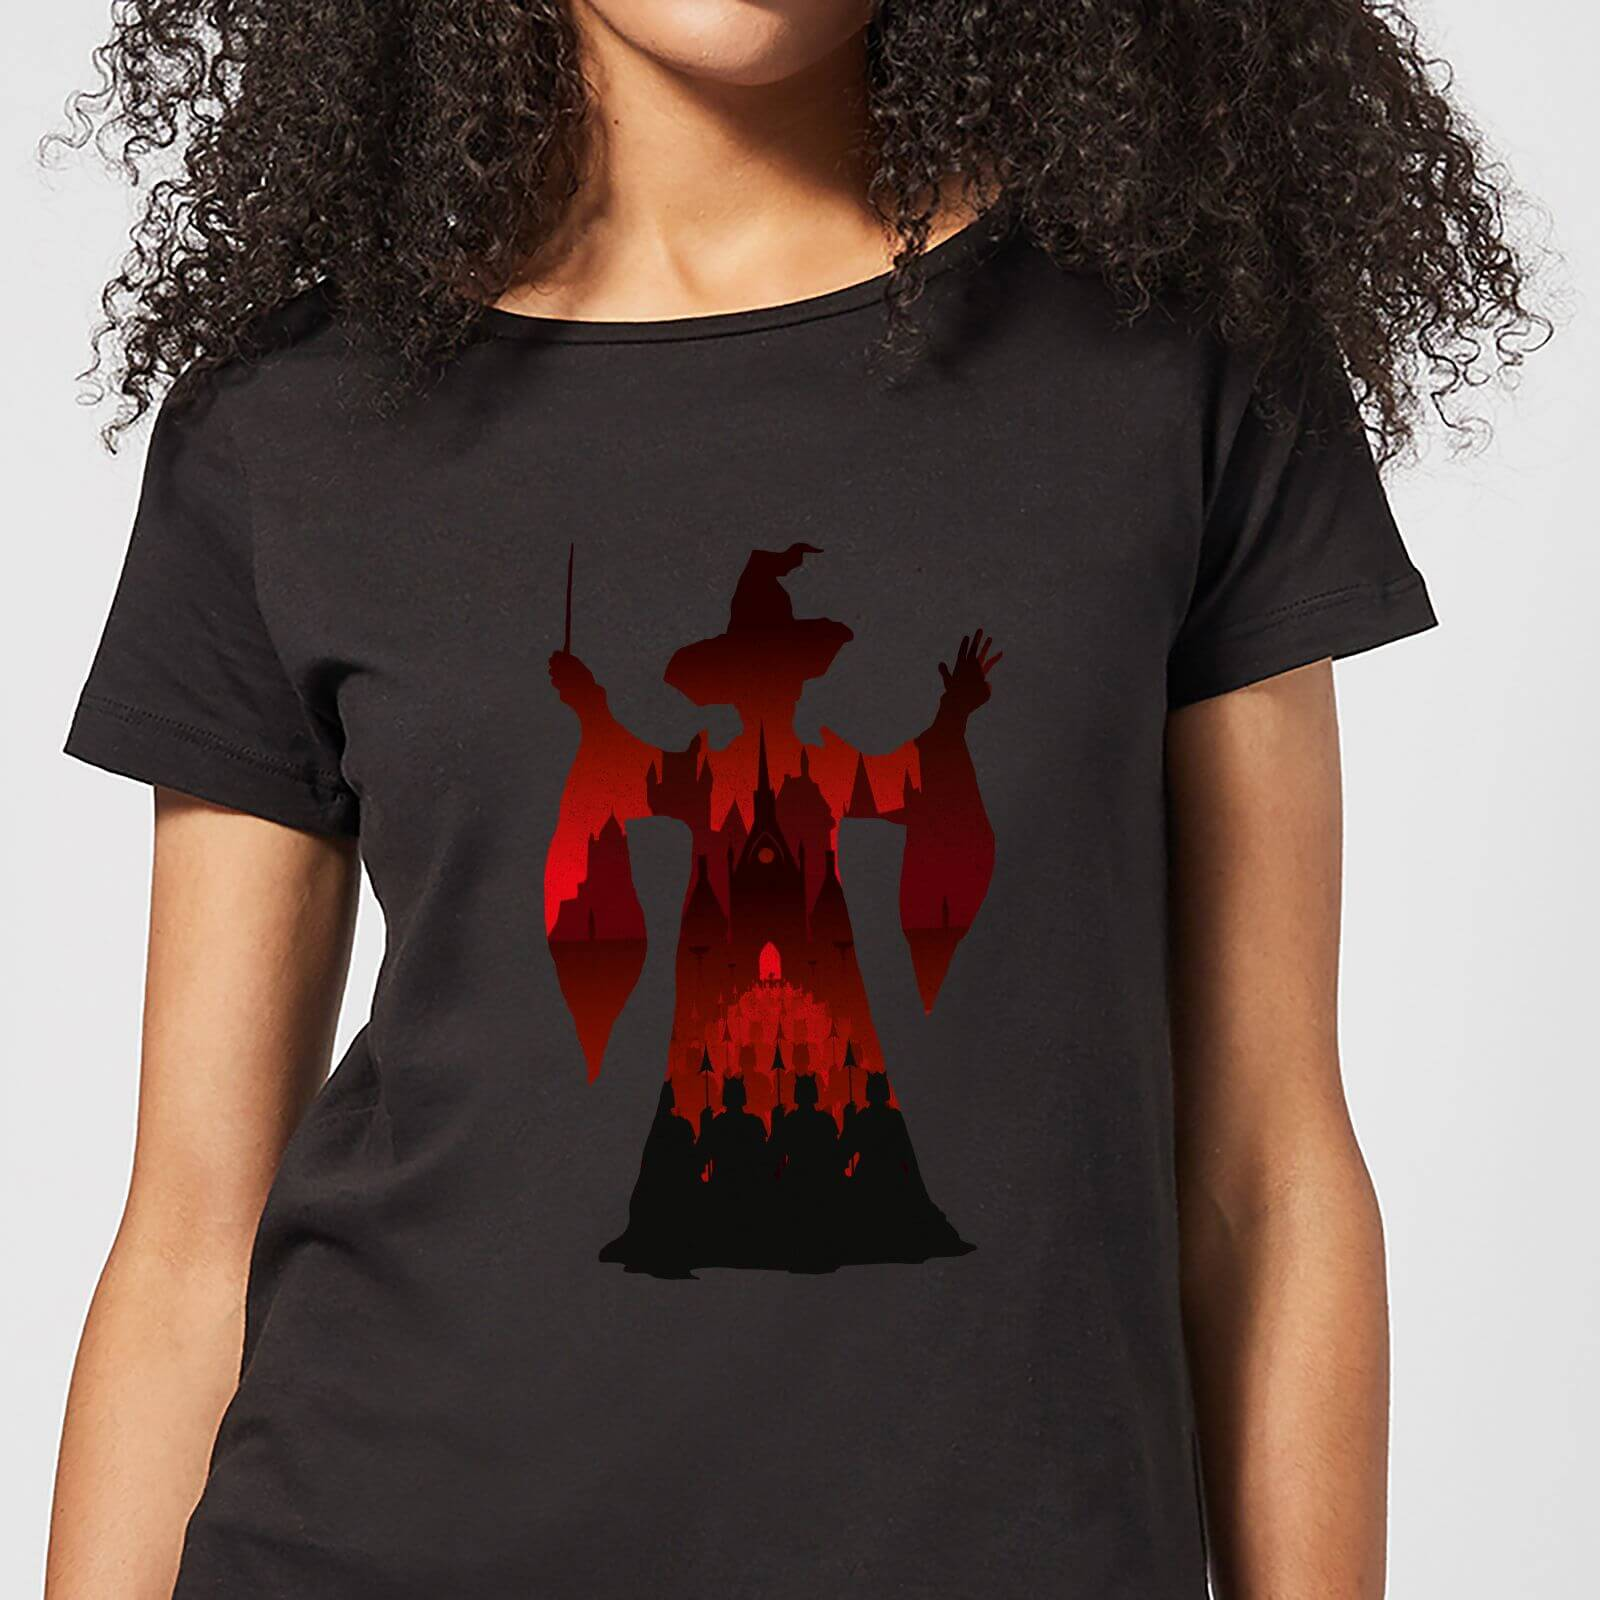 Harry Potter McGonagall Silhouette Women's T-Shirt - Black - XXL - Black